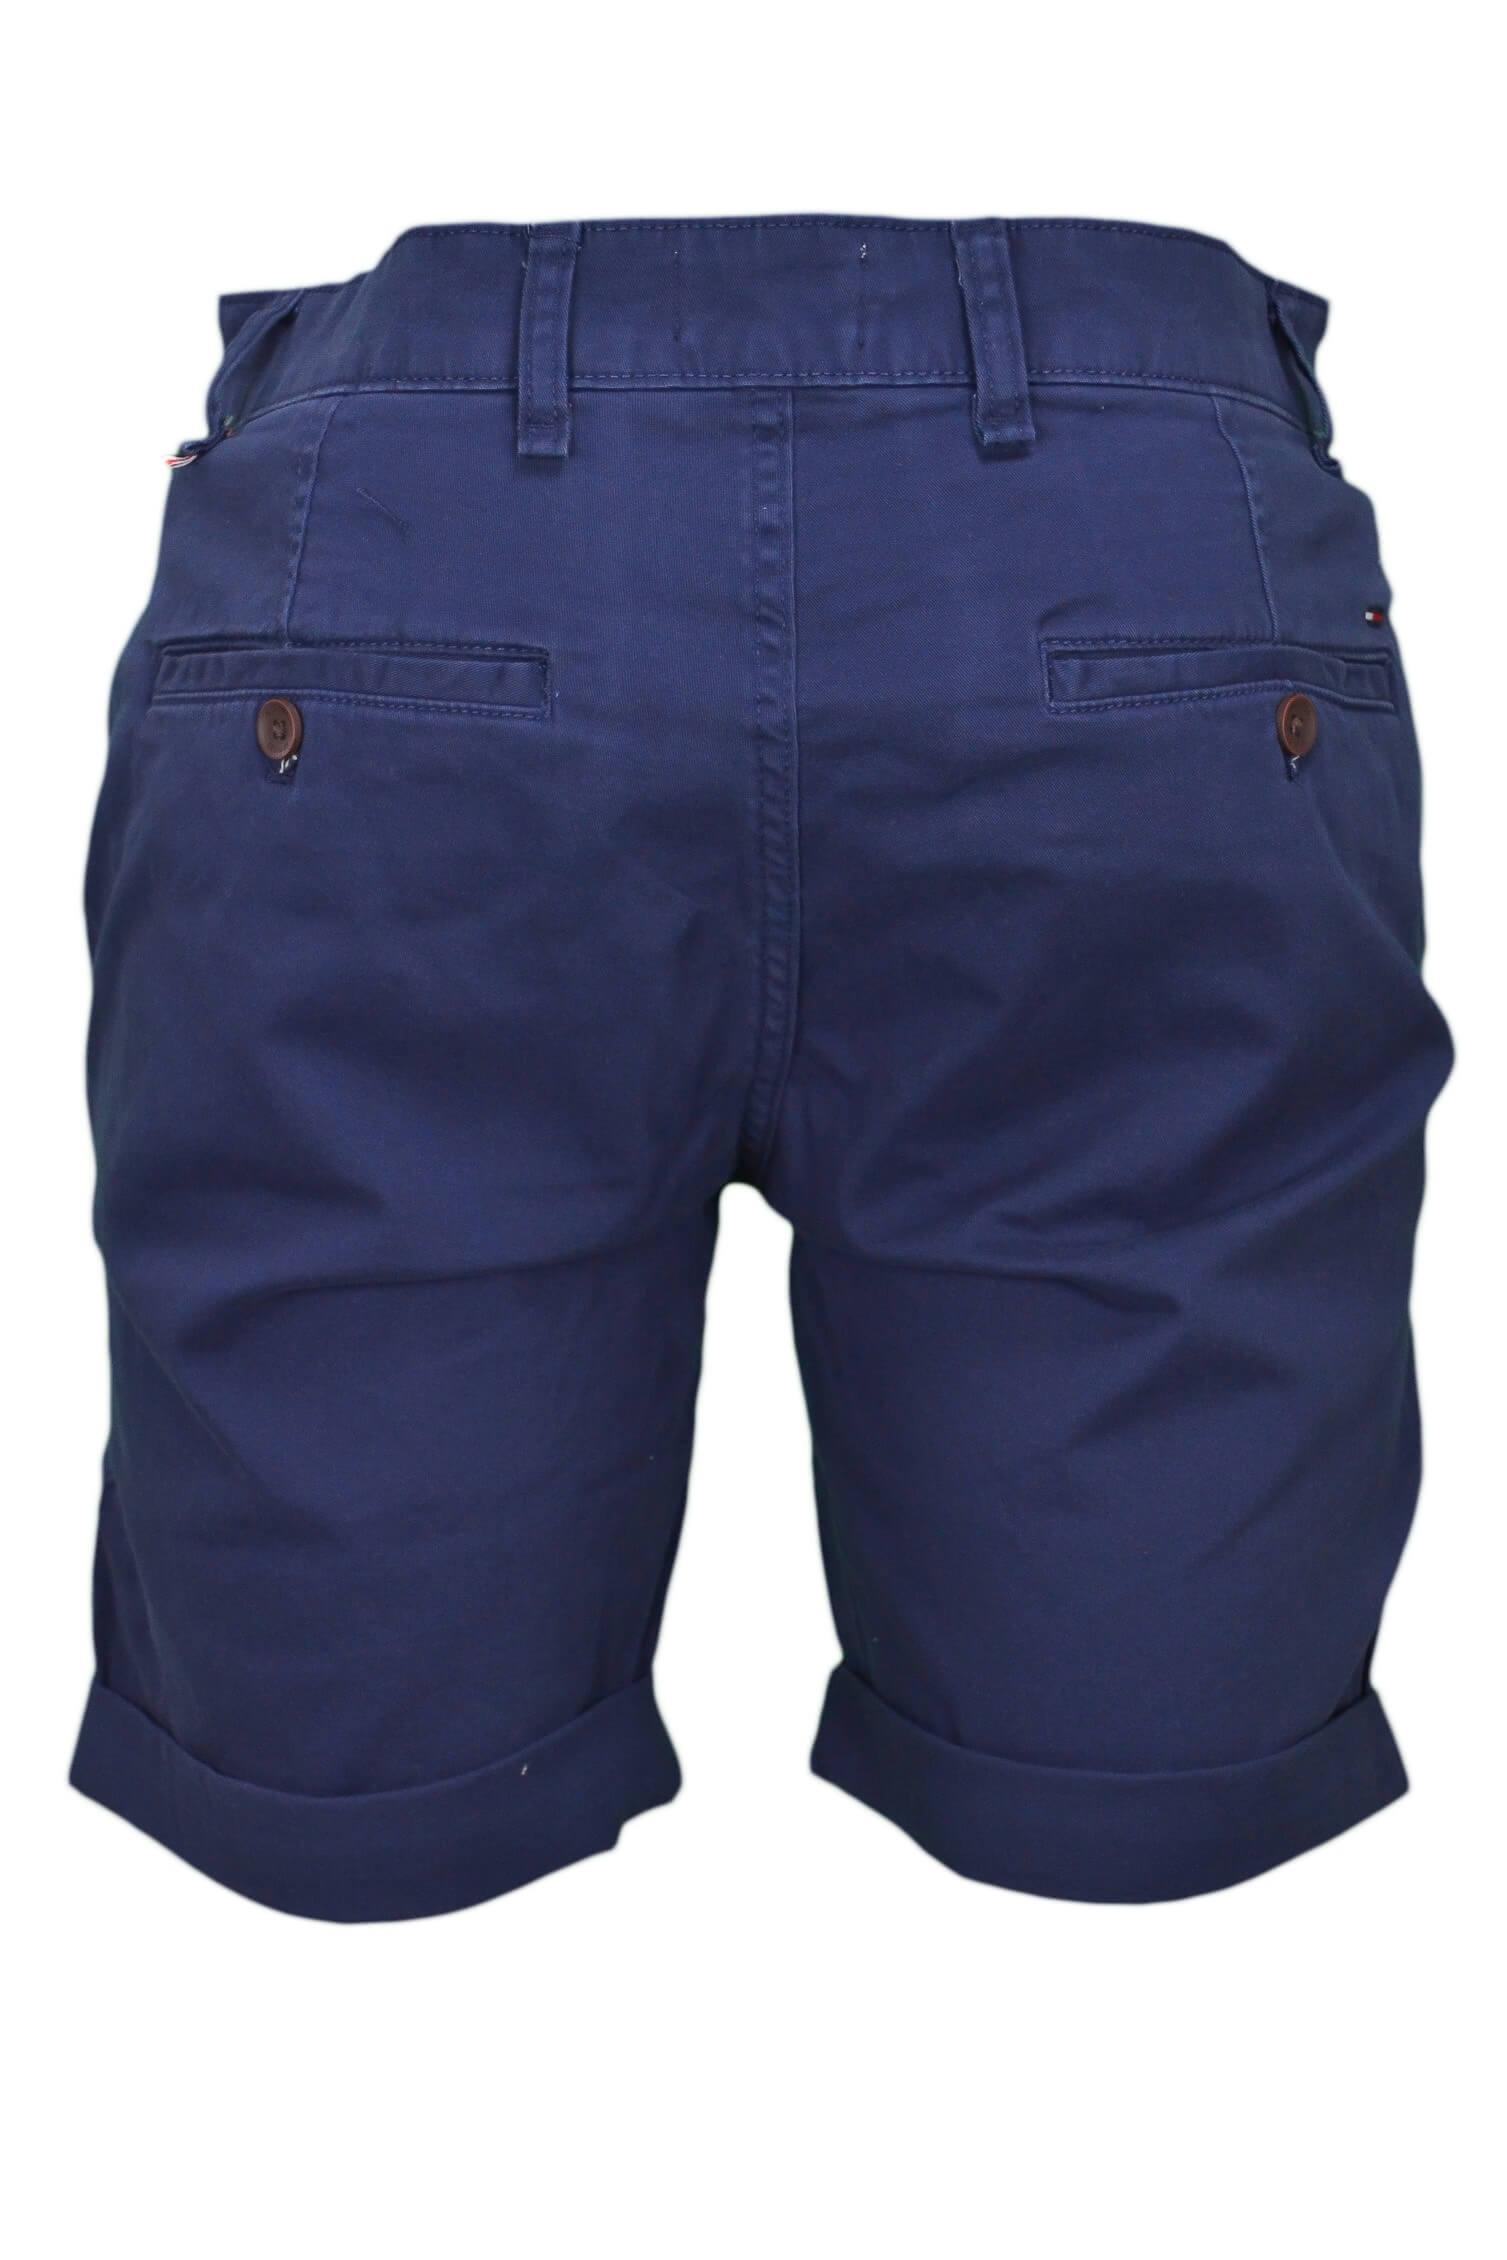 Short chino Tommy Jeans bleu marine régular pour homme - Toujours a... 1249069bada